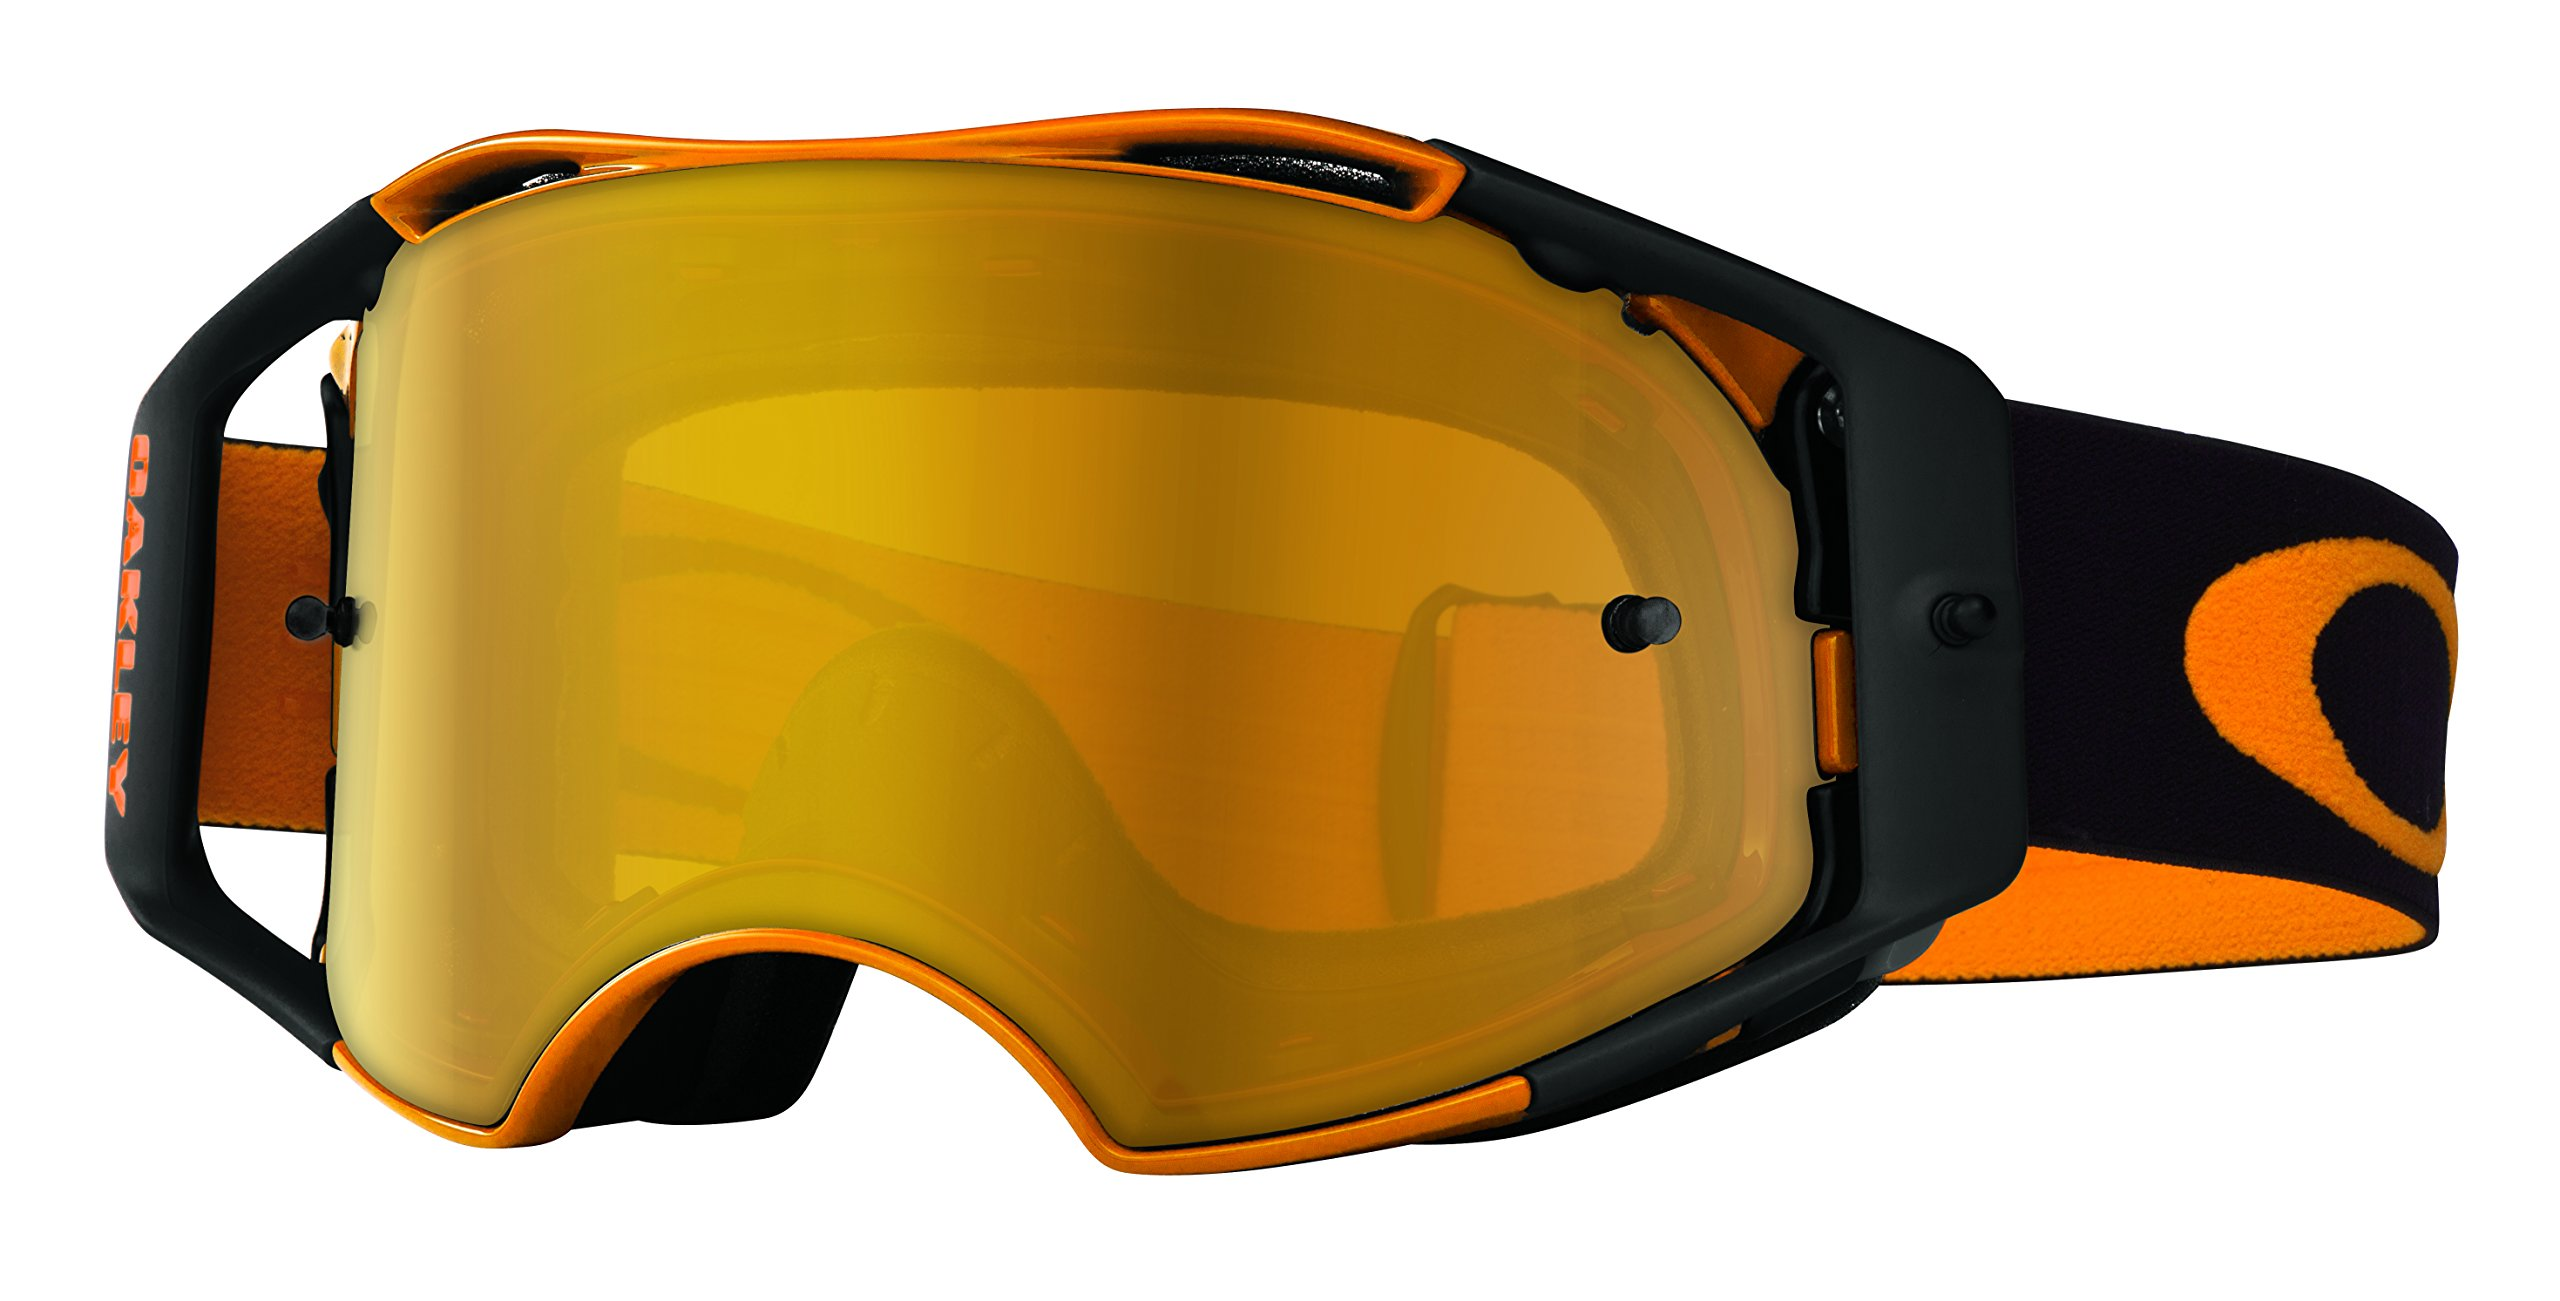 Oakley Airbrake MX Herlings Signature Series Goggles (Orange Frame/Fire Iridium Lens)